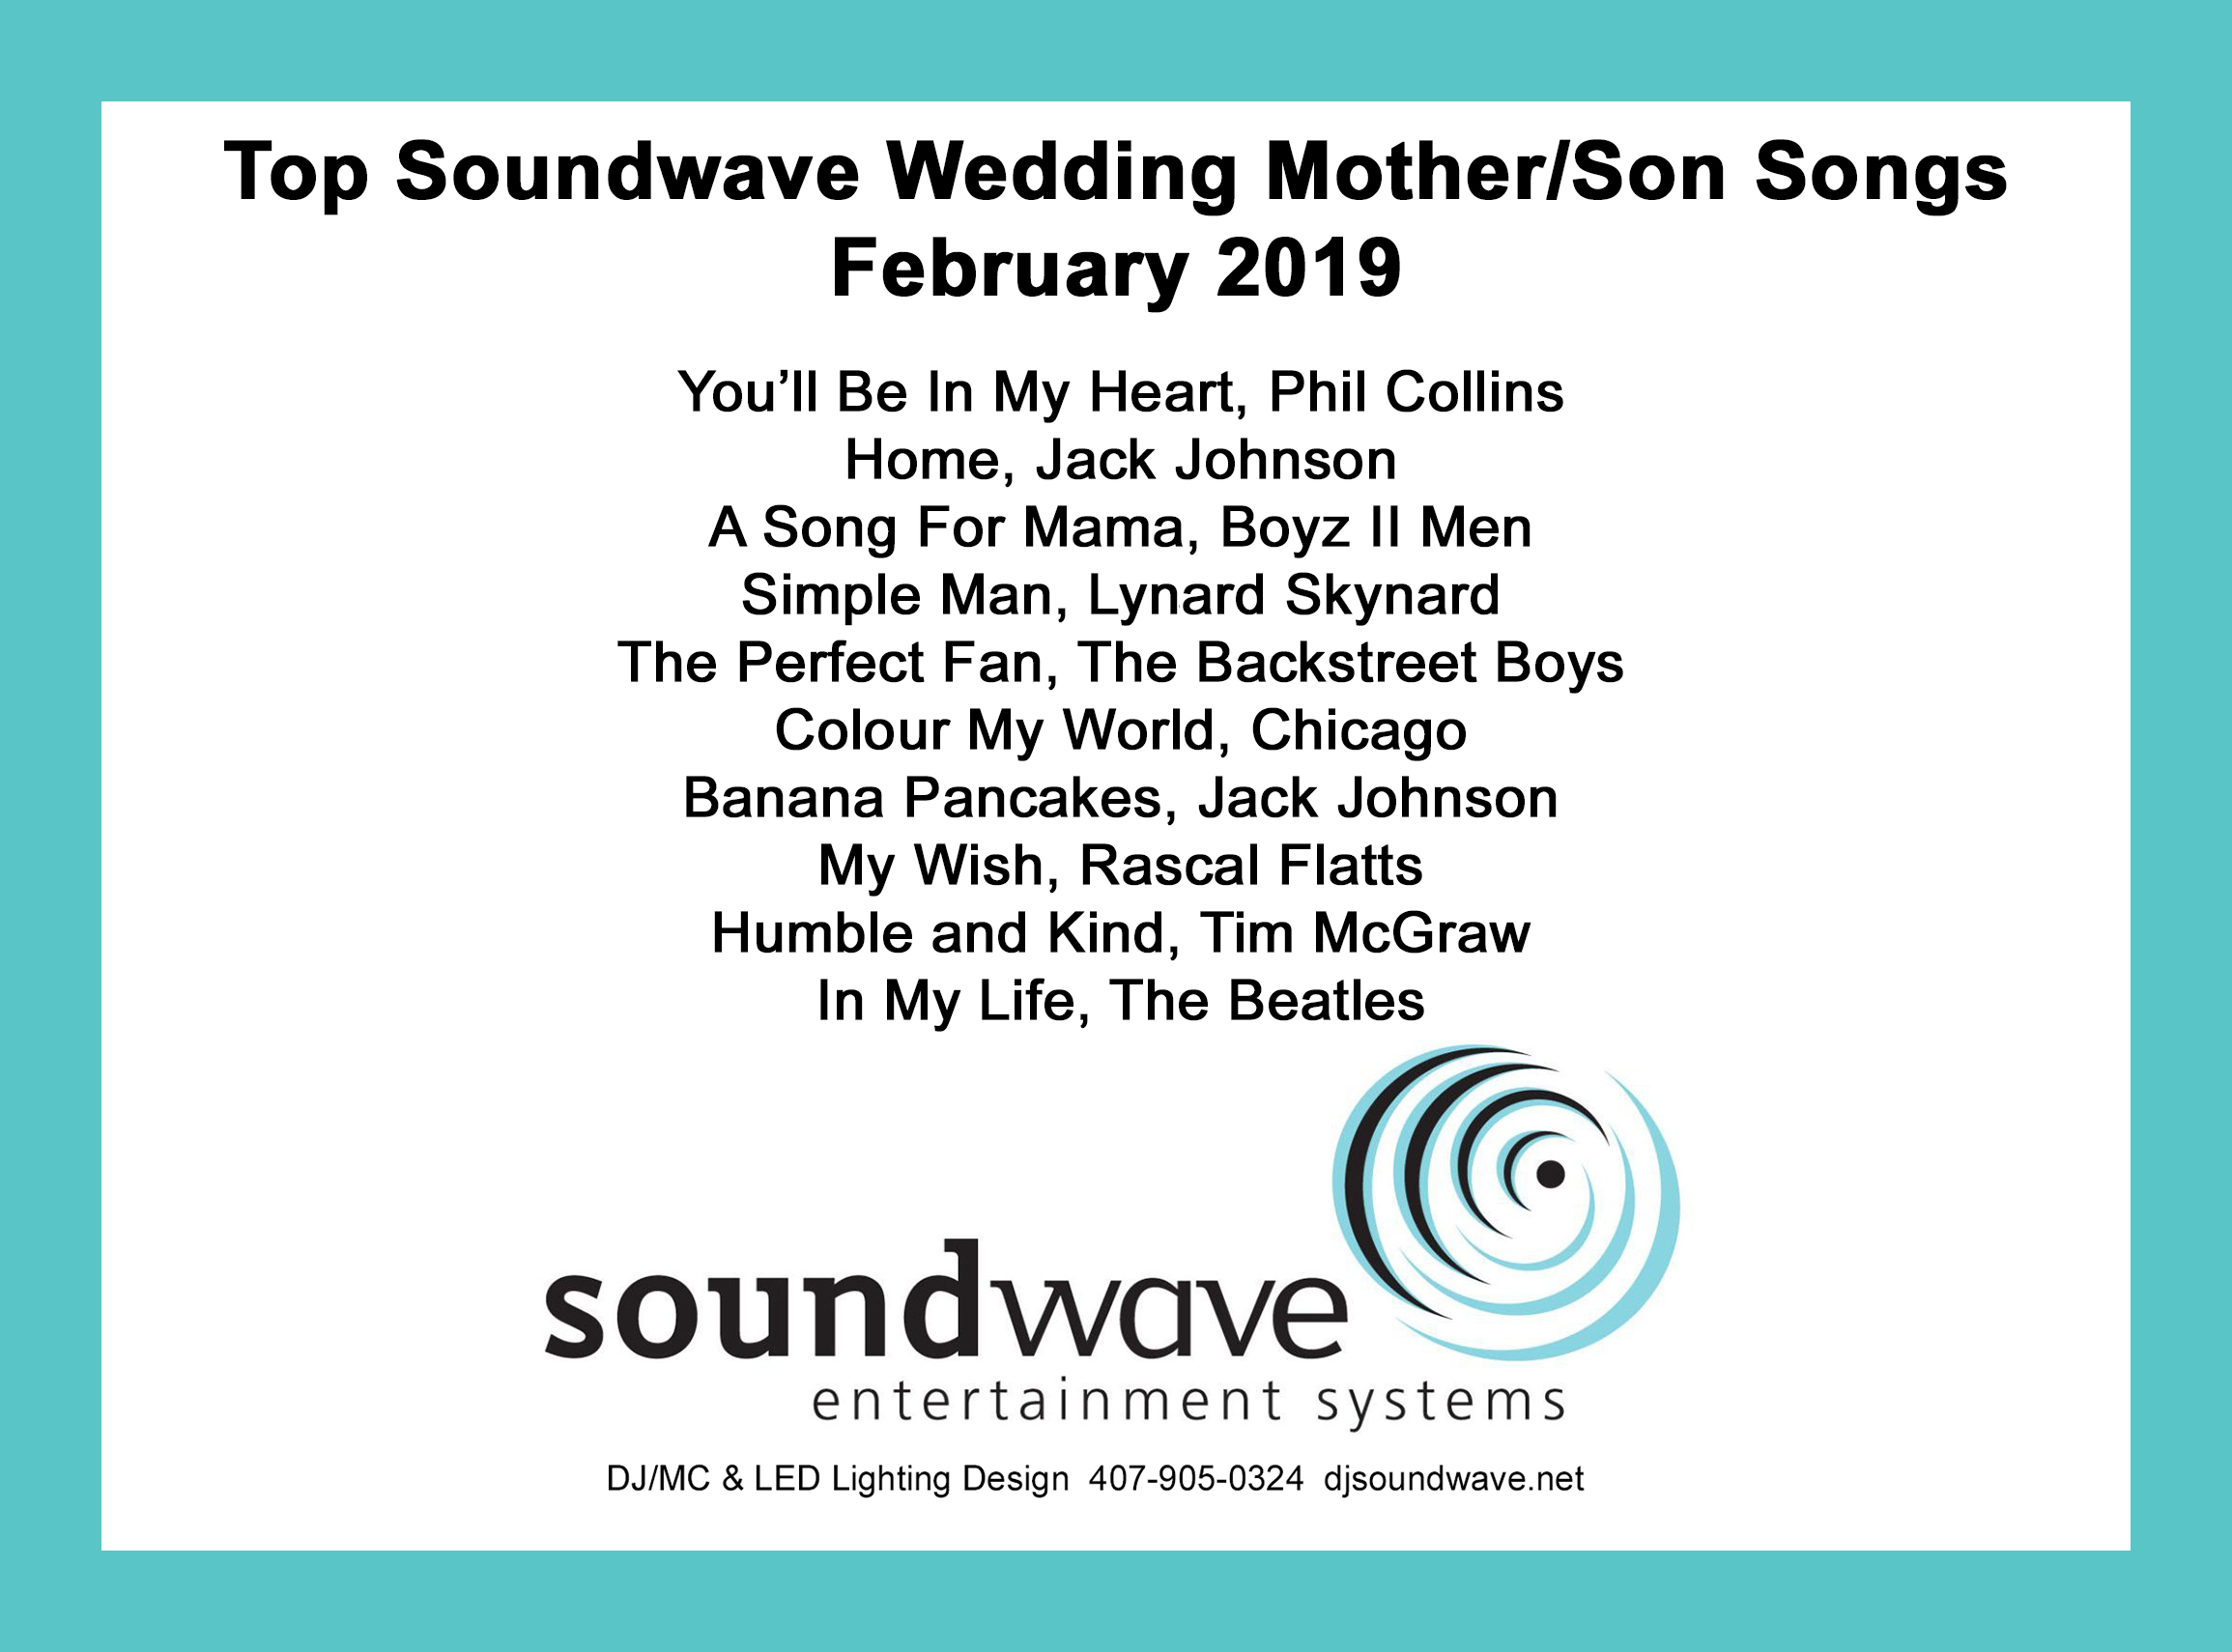 mother son dance songs - orlando wedding dj - orlando djs - soundwave entertainment